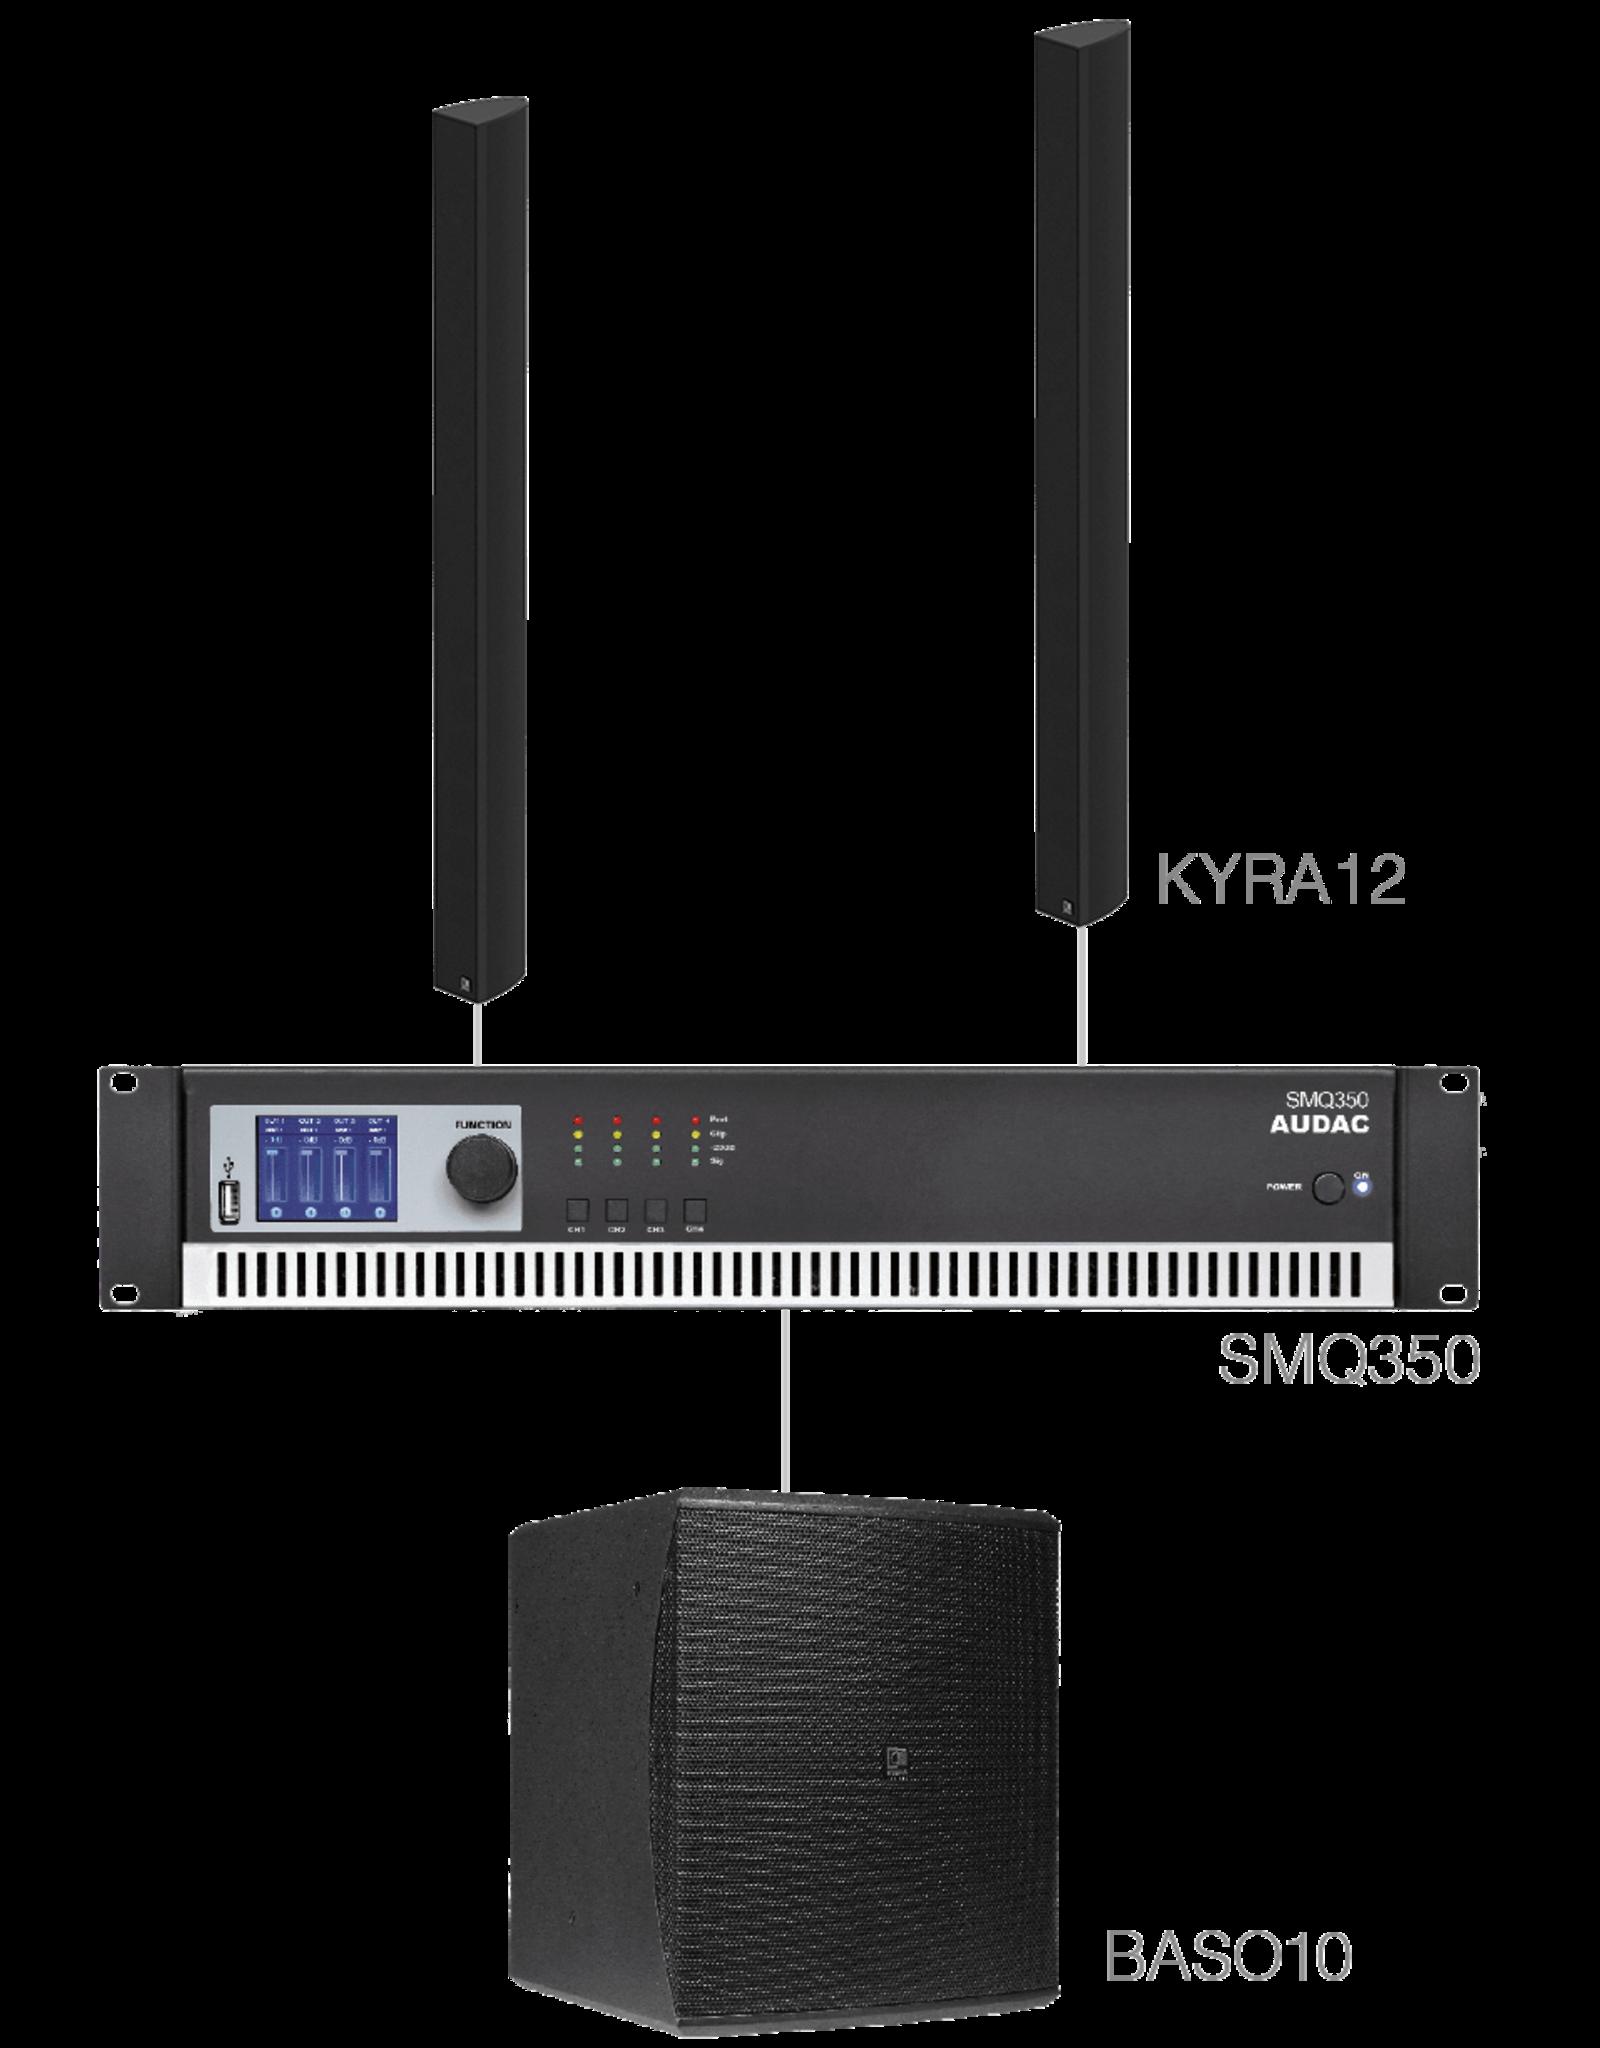 Audac 2 x KYRA12 + BASO10 + SMQ350 Black